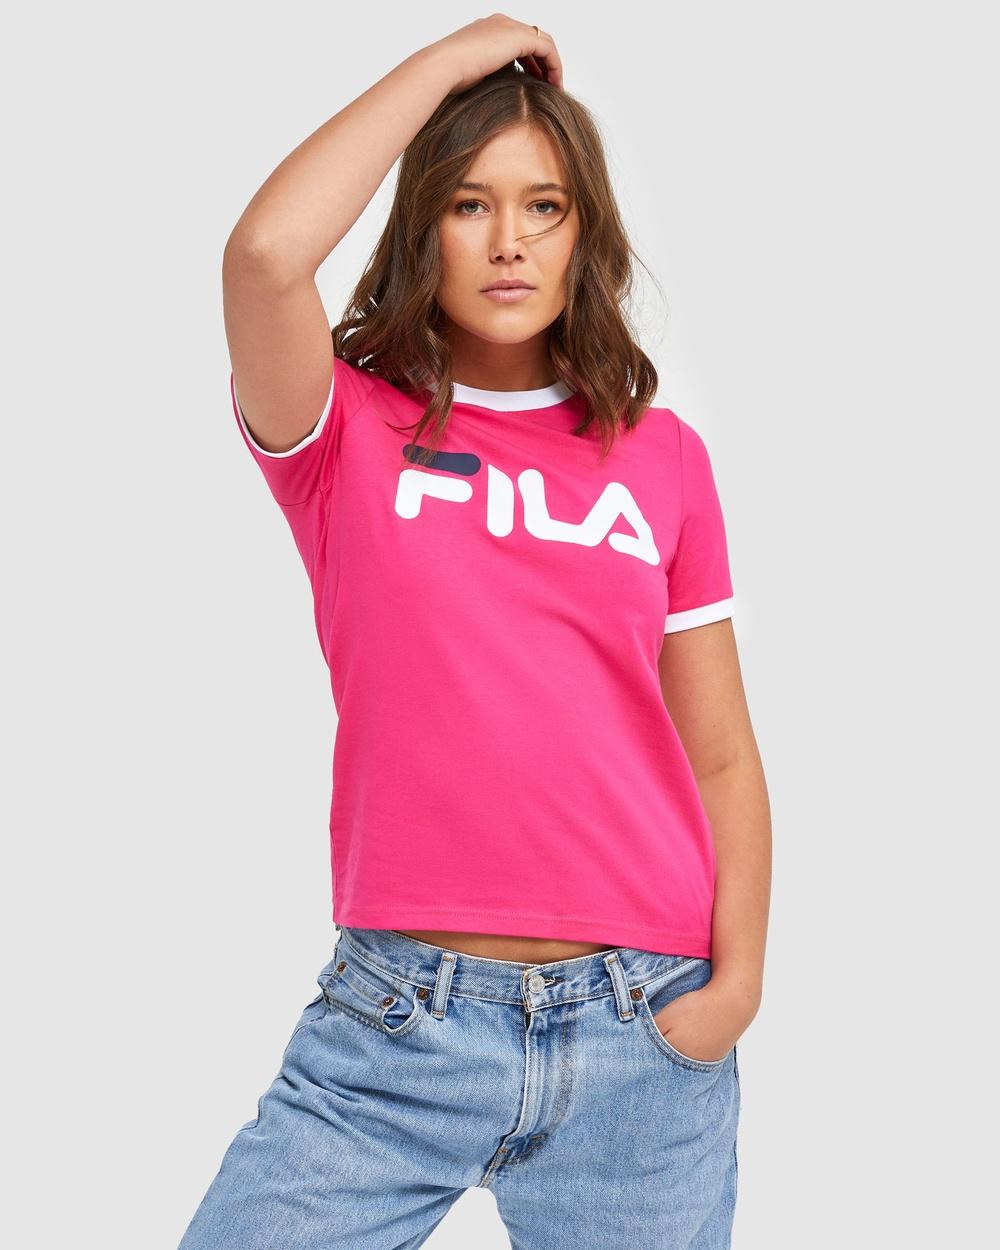 Fila Classic Ringer Tee T-Shirts & Singlets Beetroot Australia